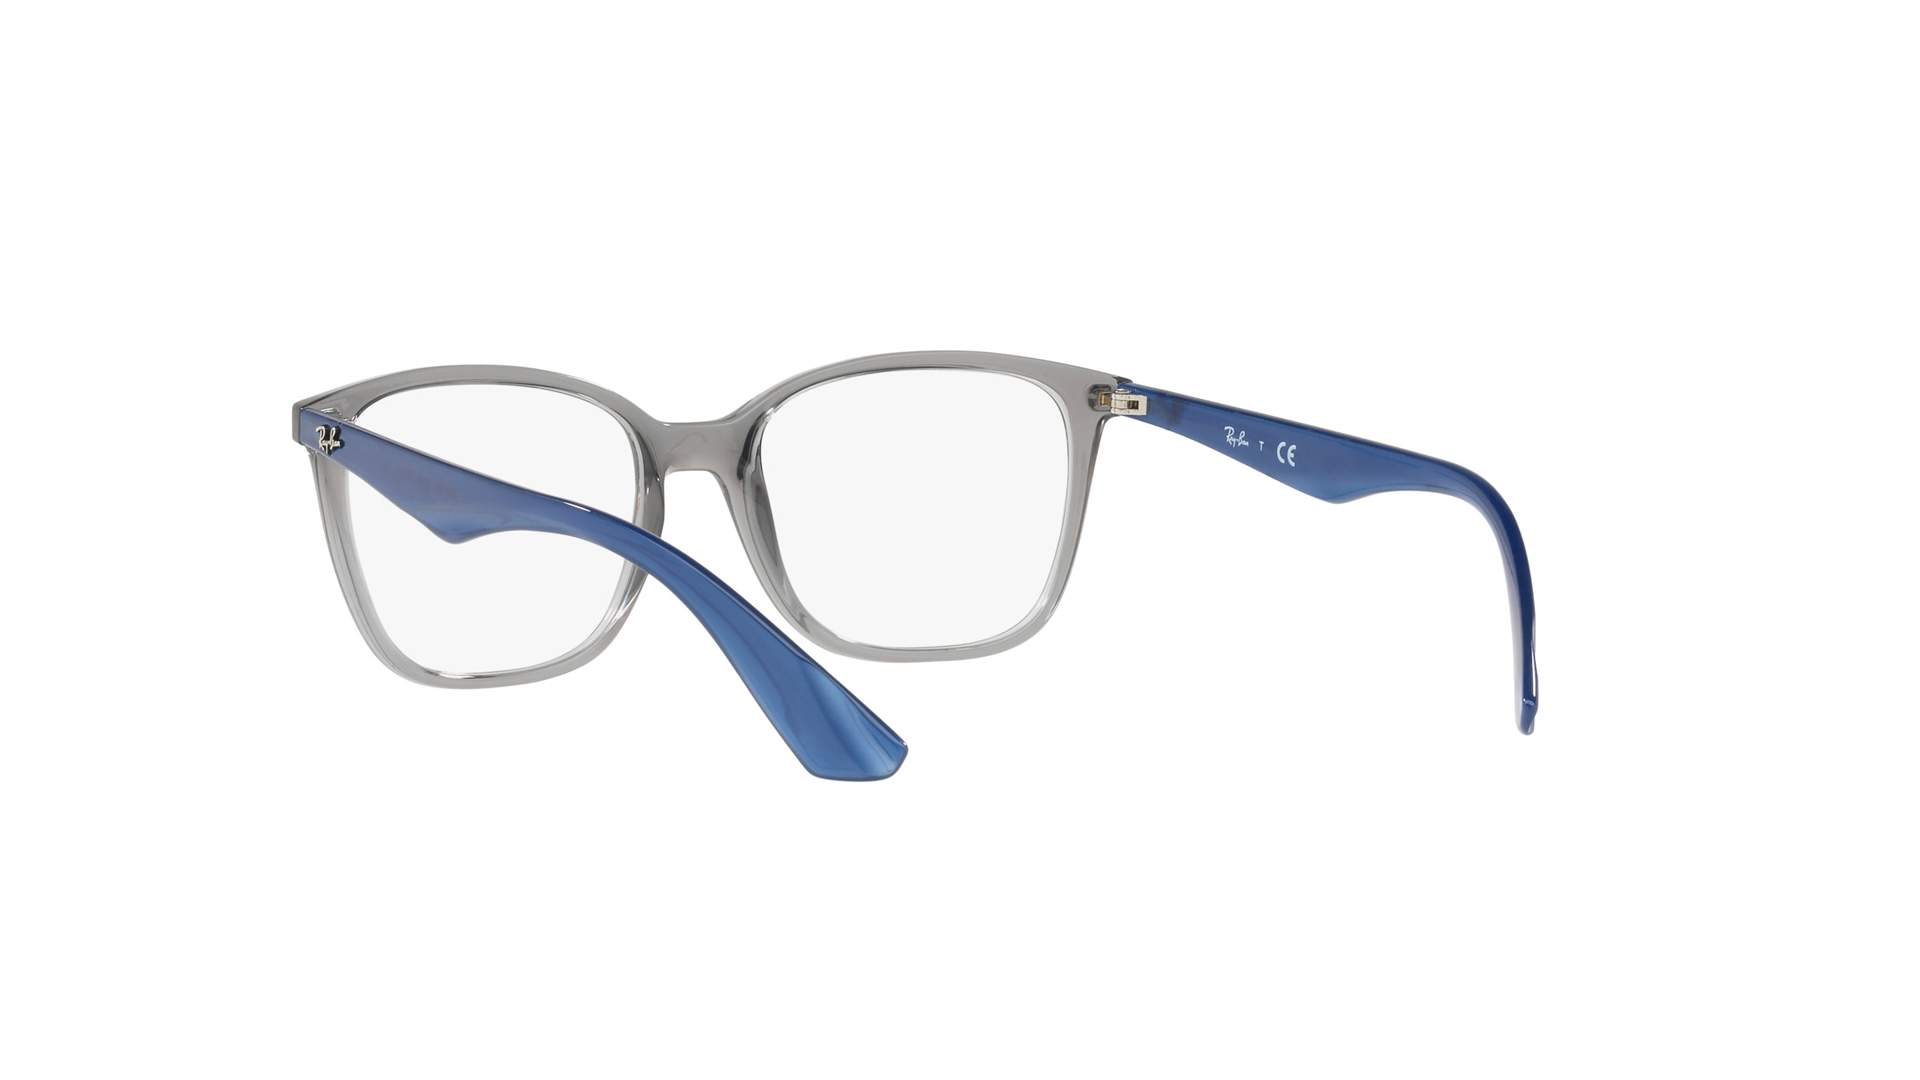 d07e1751750 Eyeglasses Ray-Ban RX7066 RB7066 5769 52-17 Grey Medium